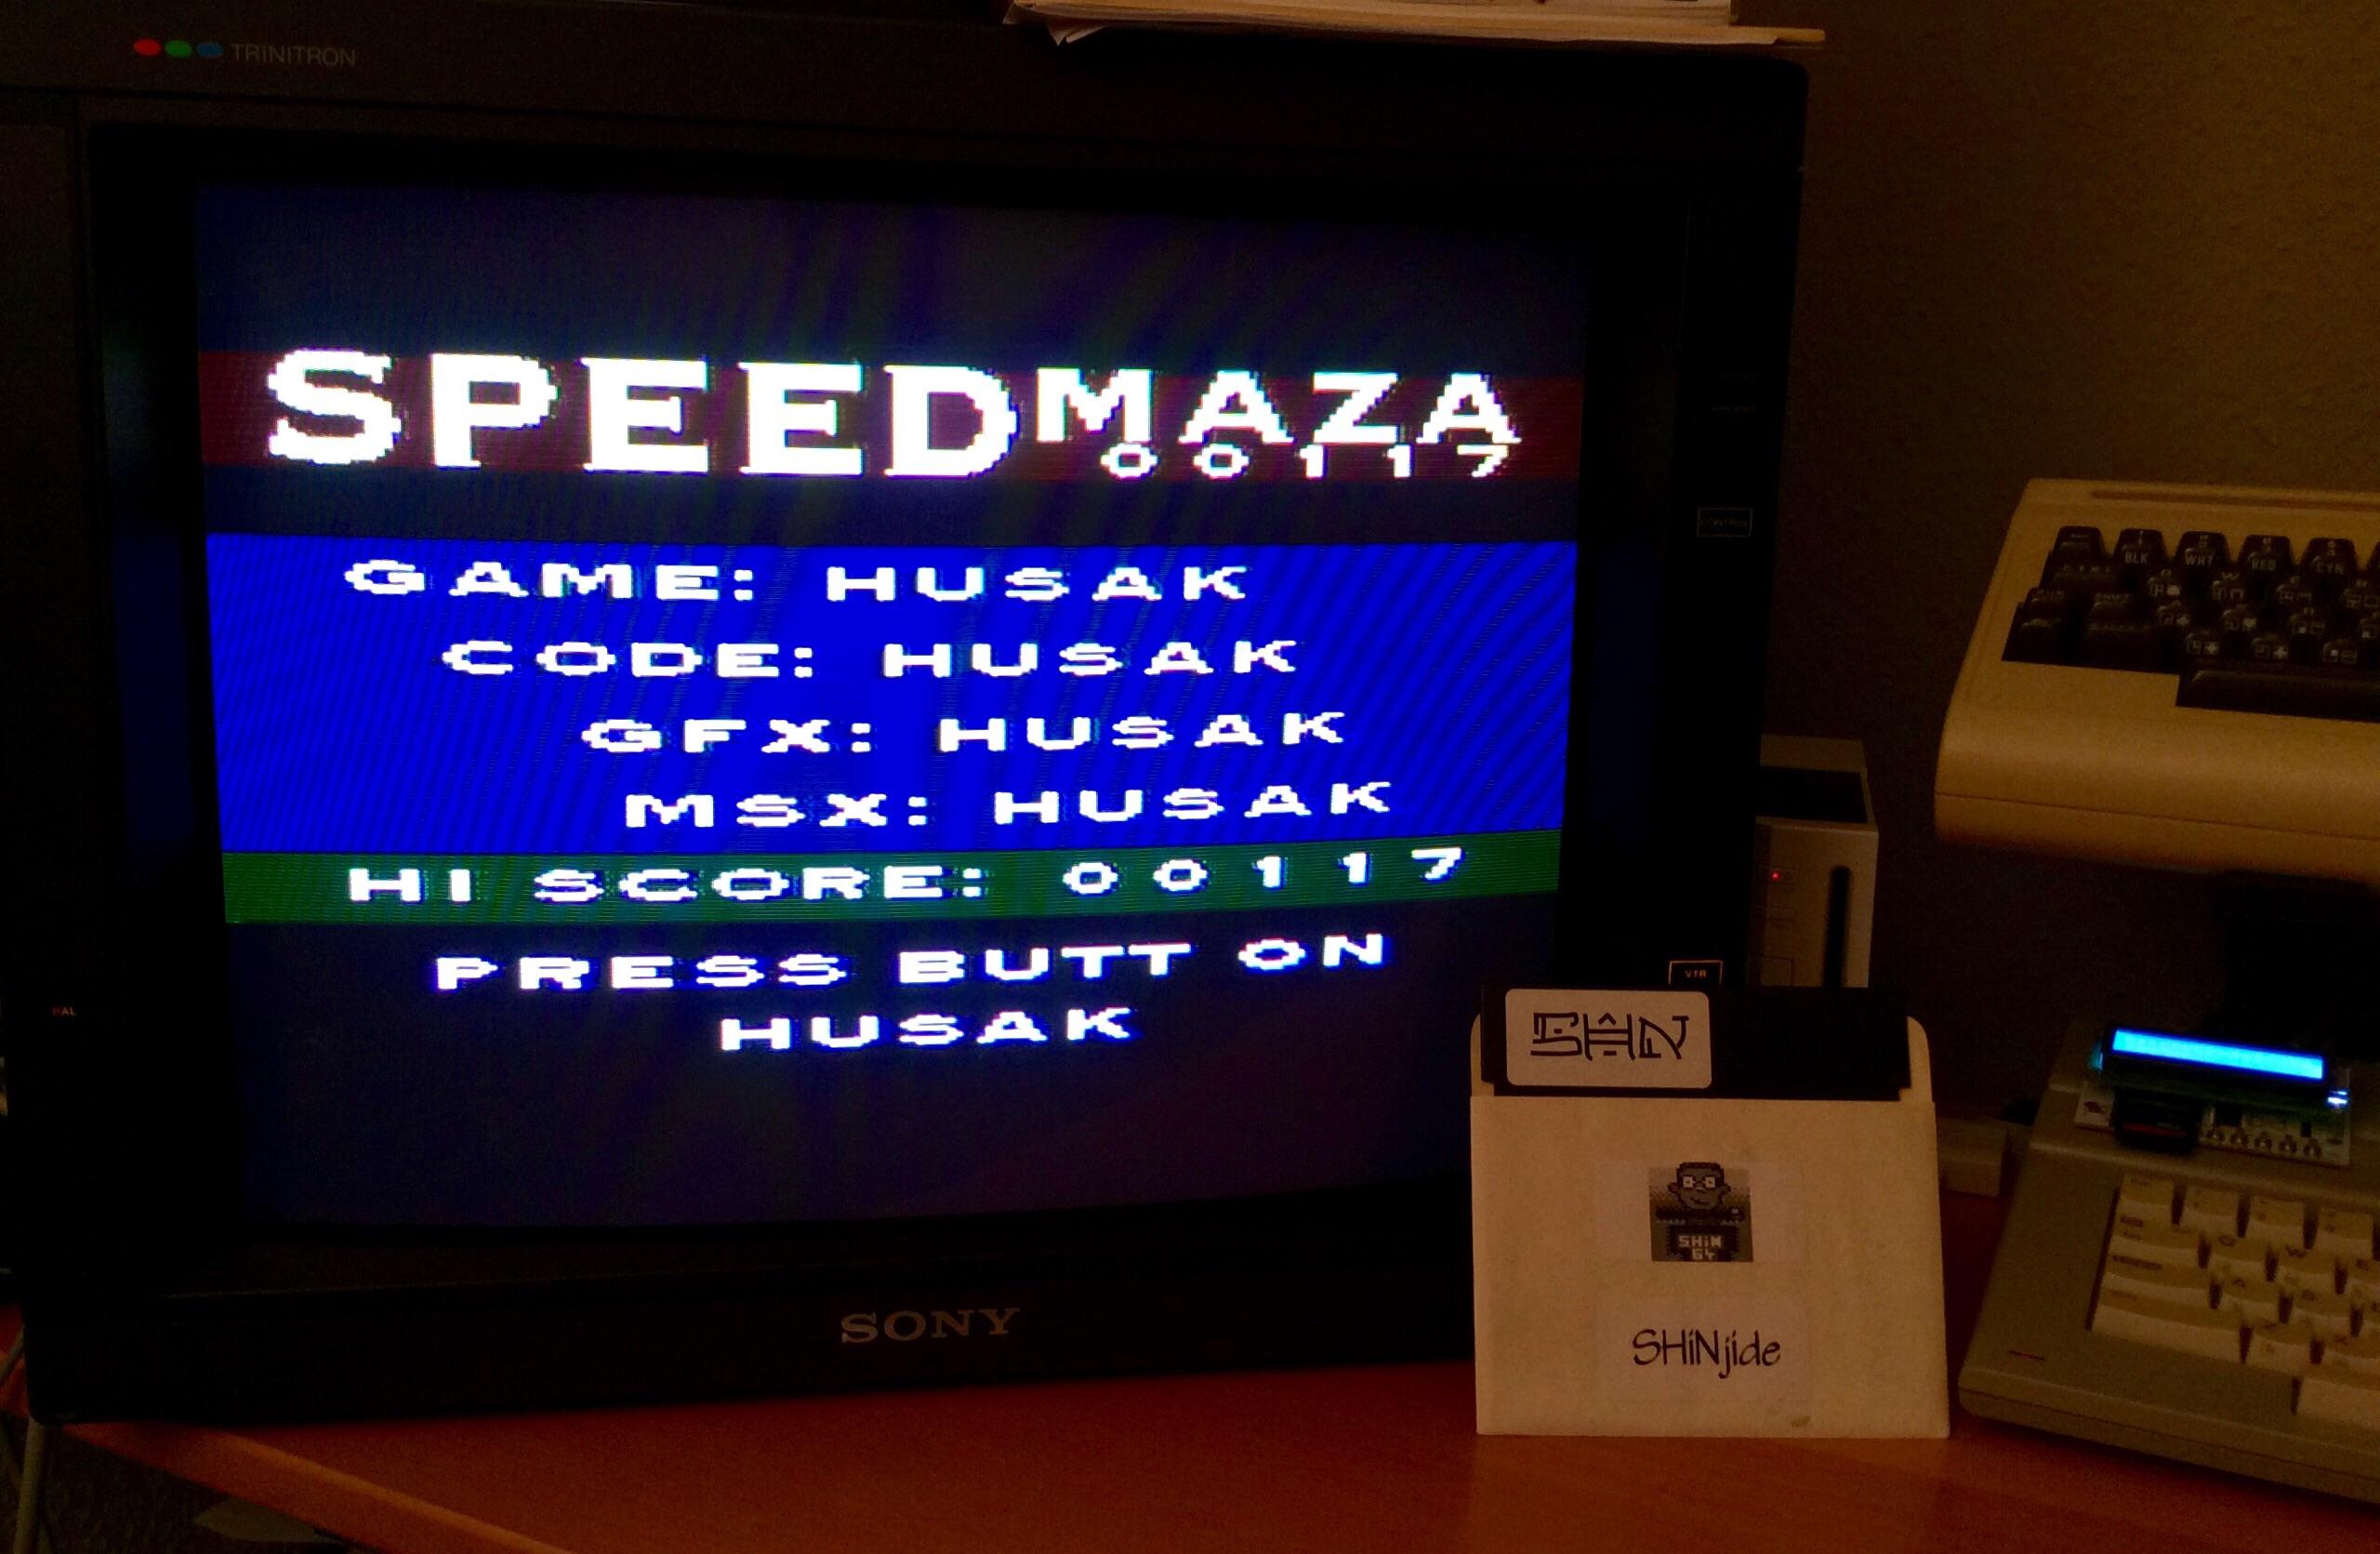 SHiNjide: SPEEDmaza (Atari 400/800/XL/XE) 117 points on 2015-01-26 14:49:39